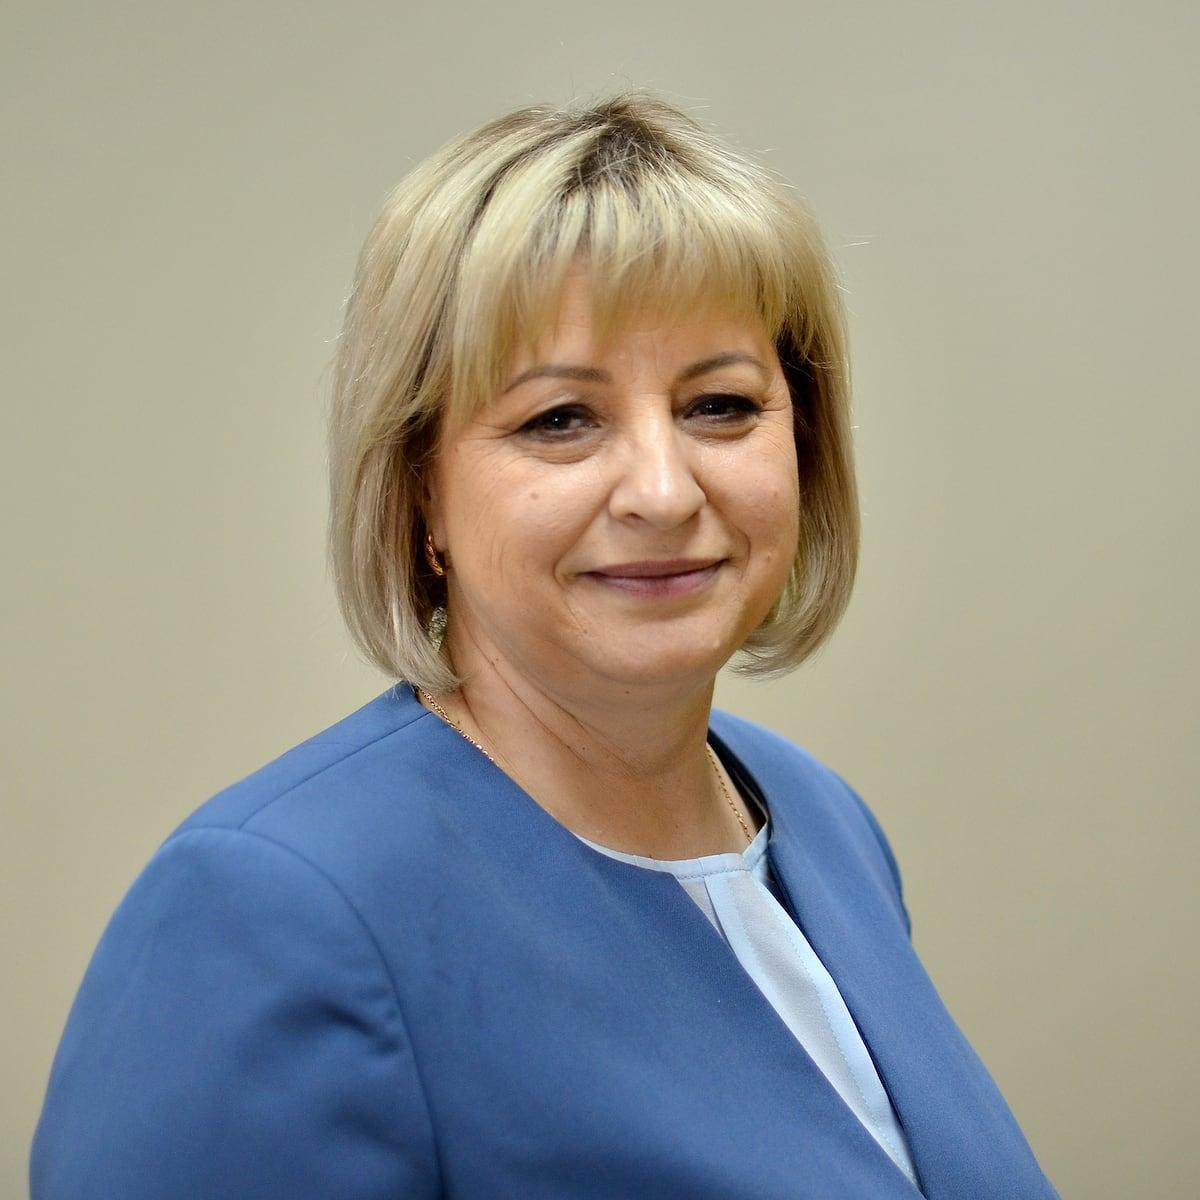 Полякова Светлана Ермолаевна